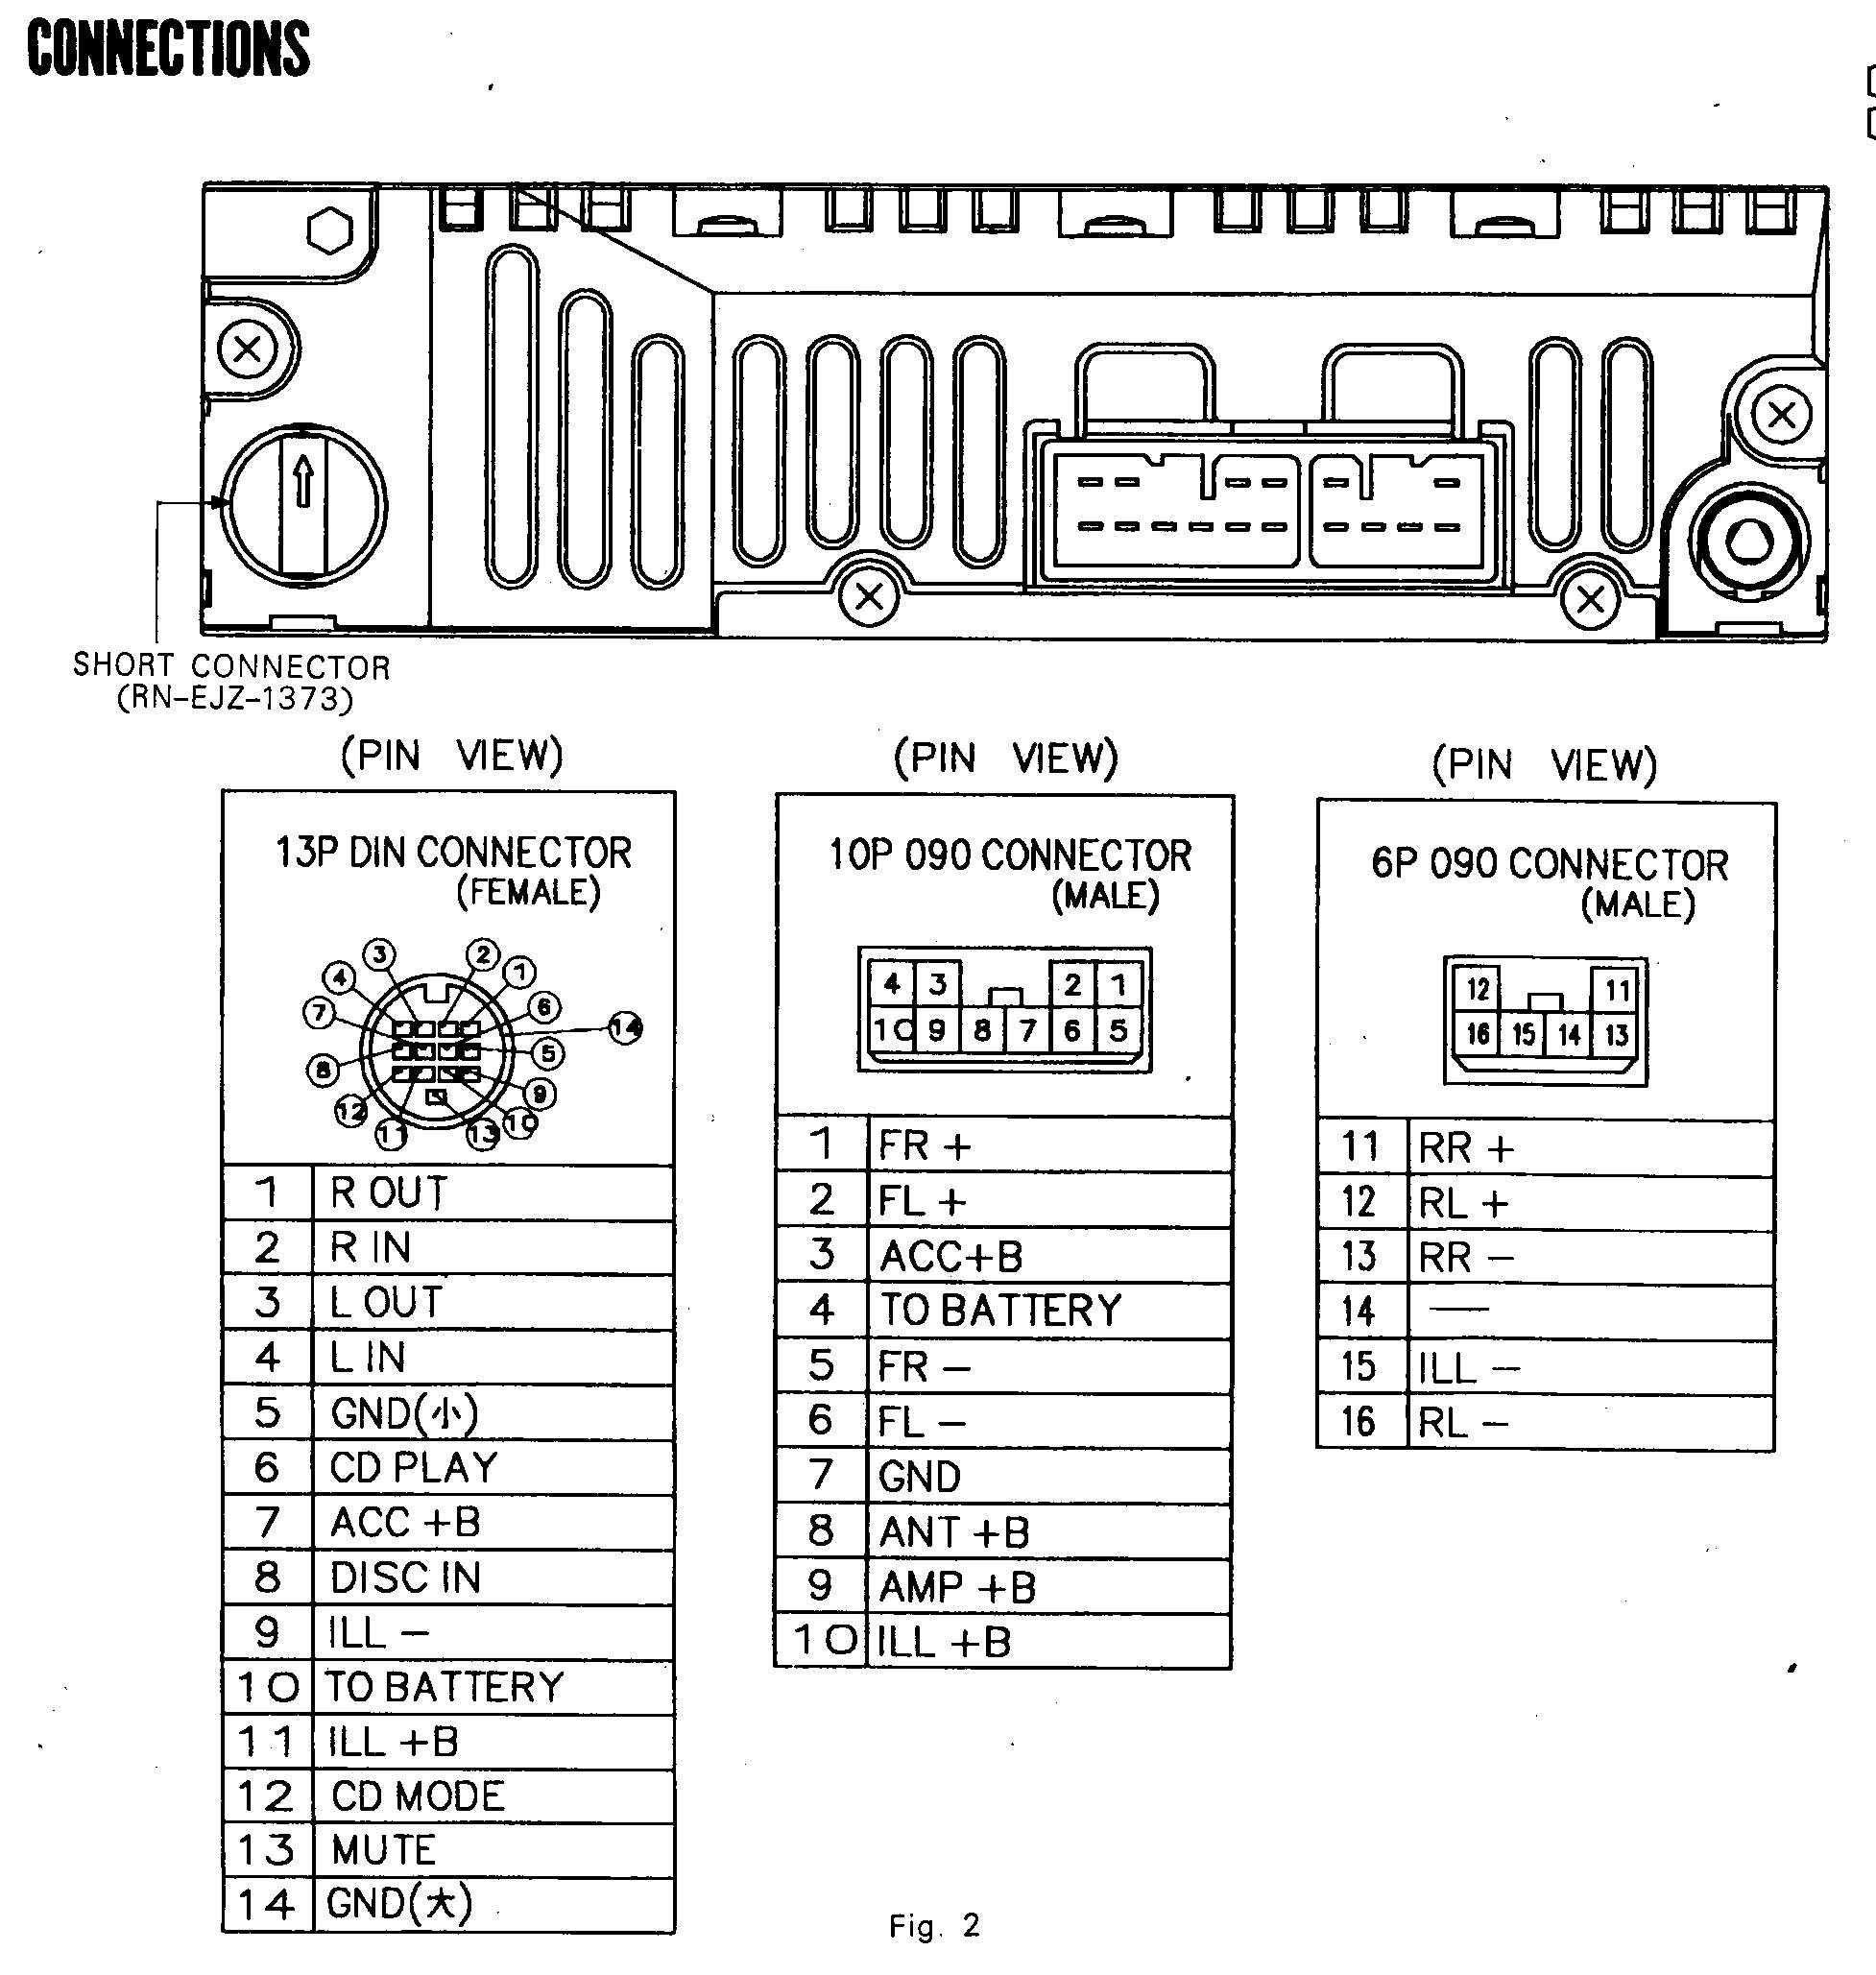 Wiring Diagram Car Audio In 2021 Pioneer Car Stereo Car Stereo Sony Car Stereo